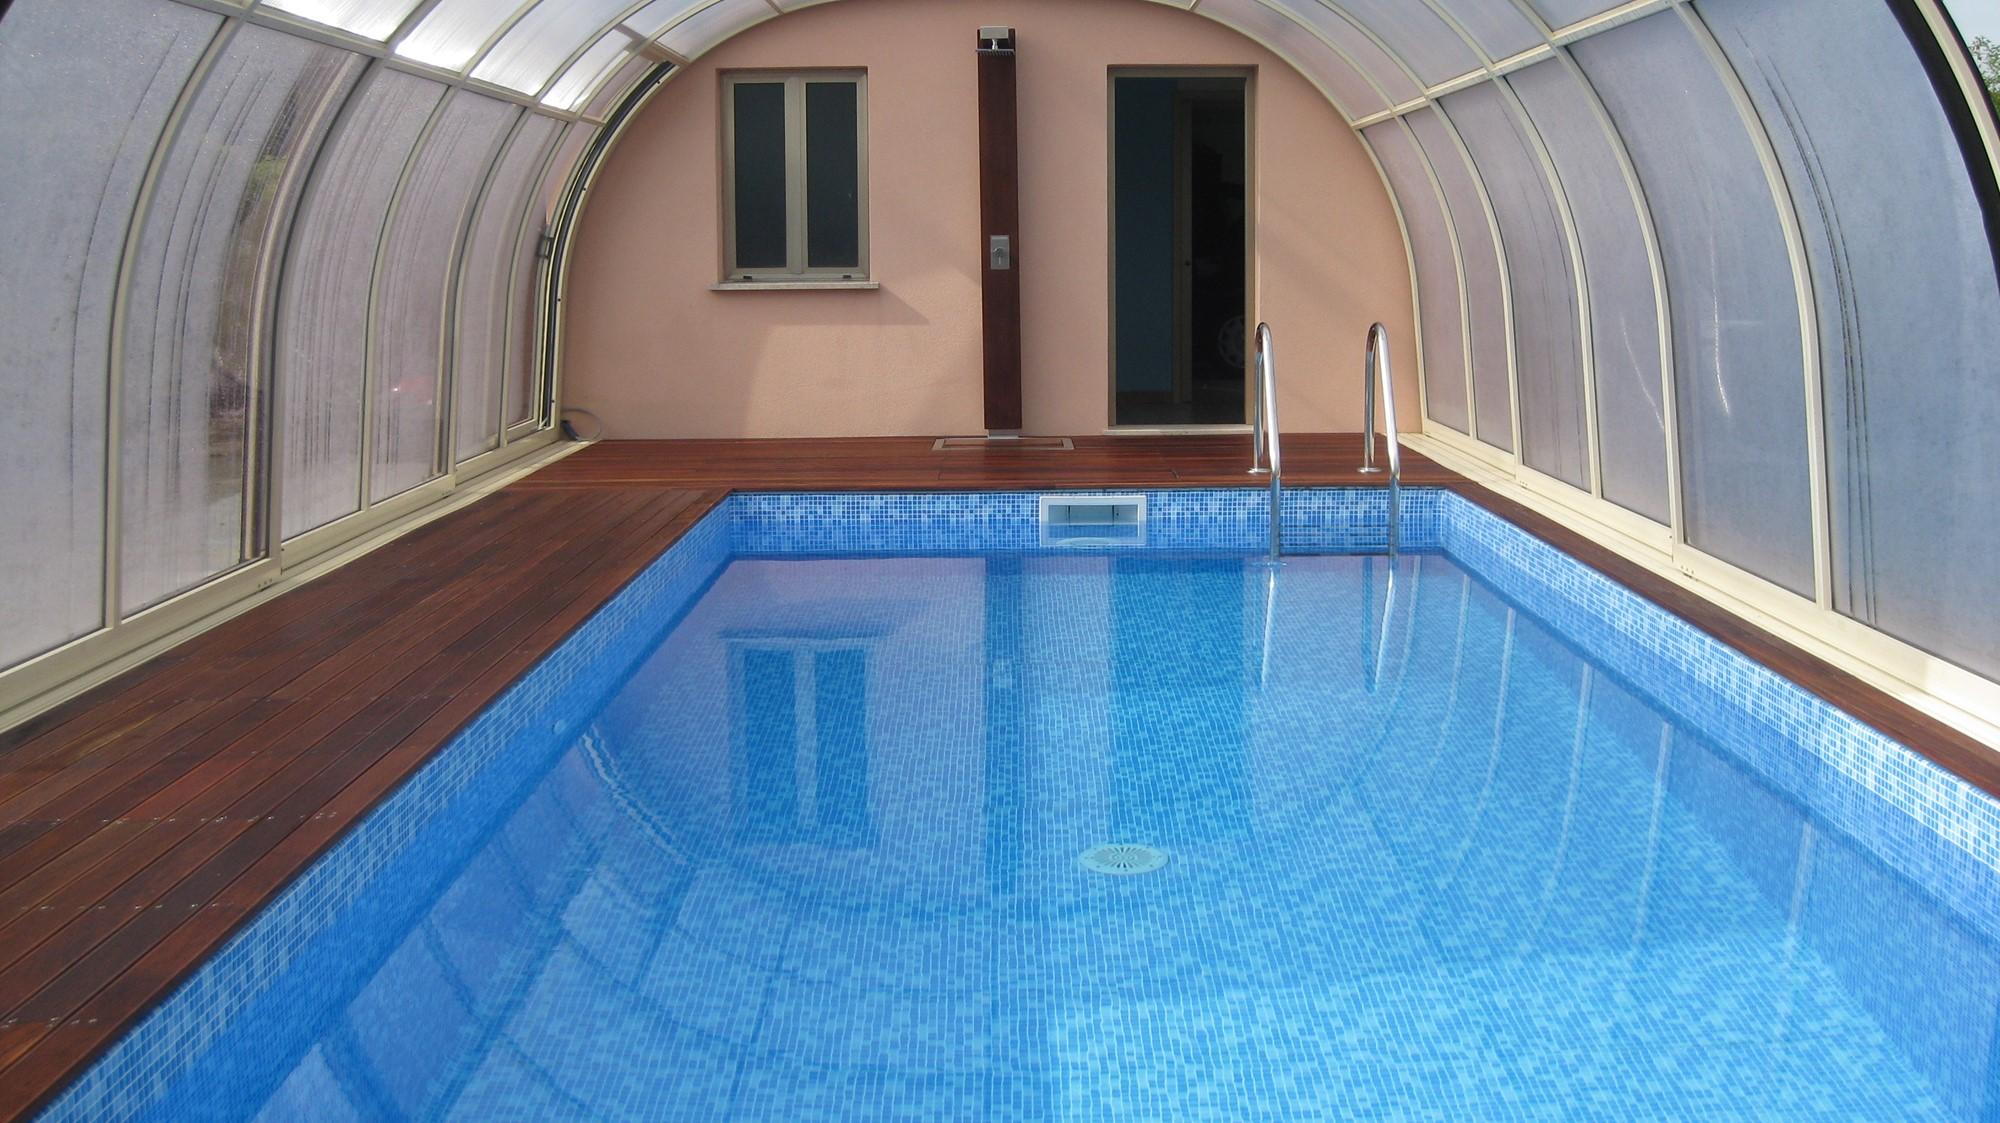 Piscine - Foto di piscine interrate ...